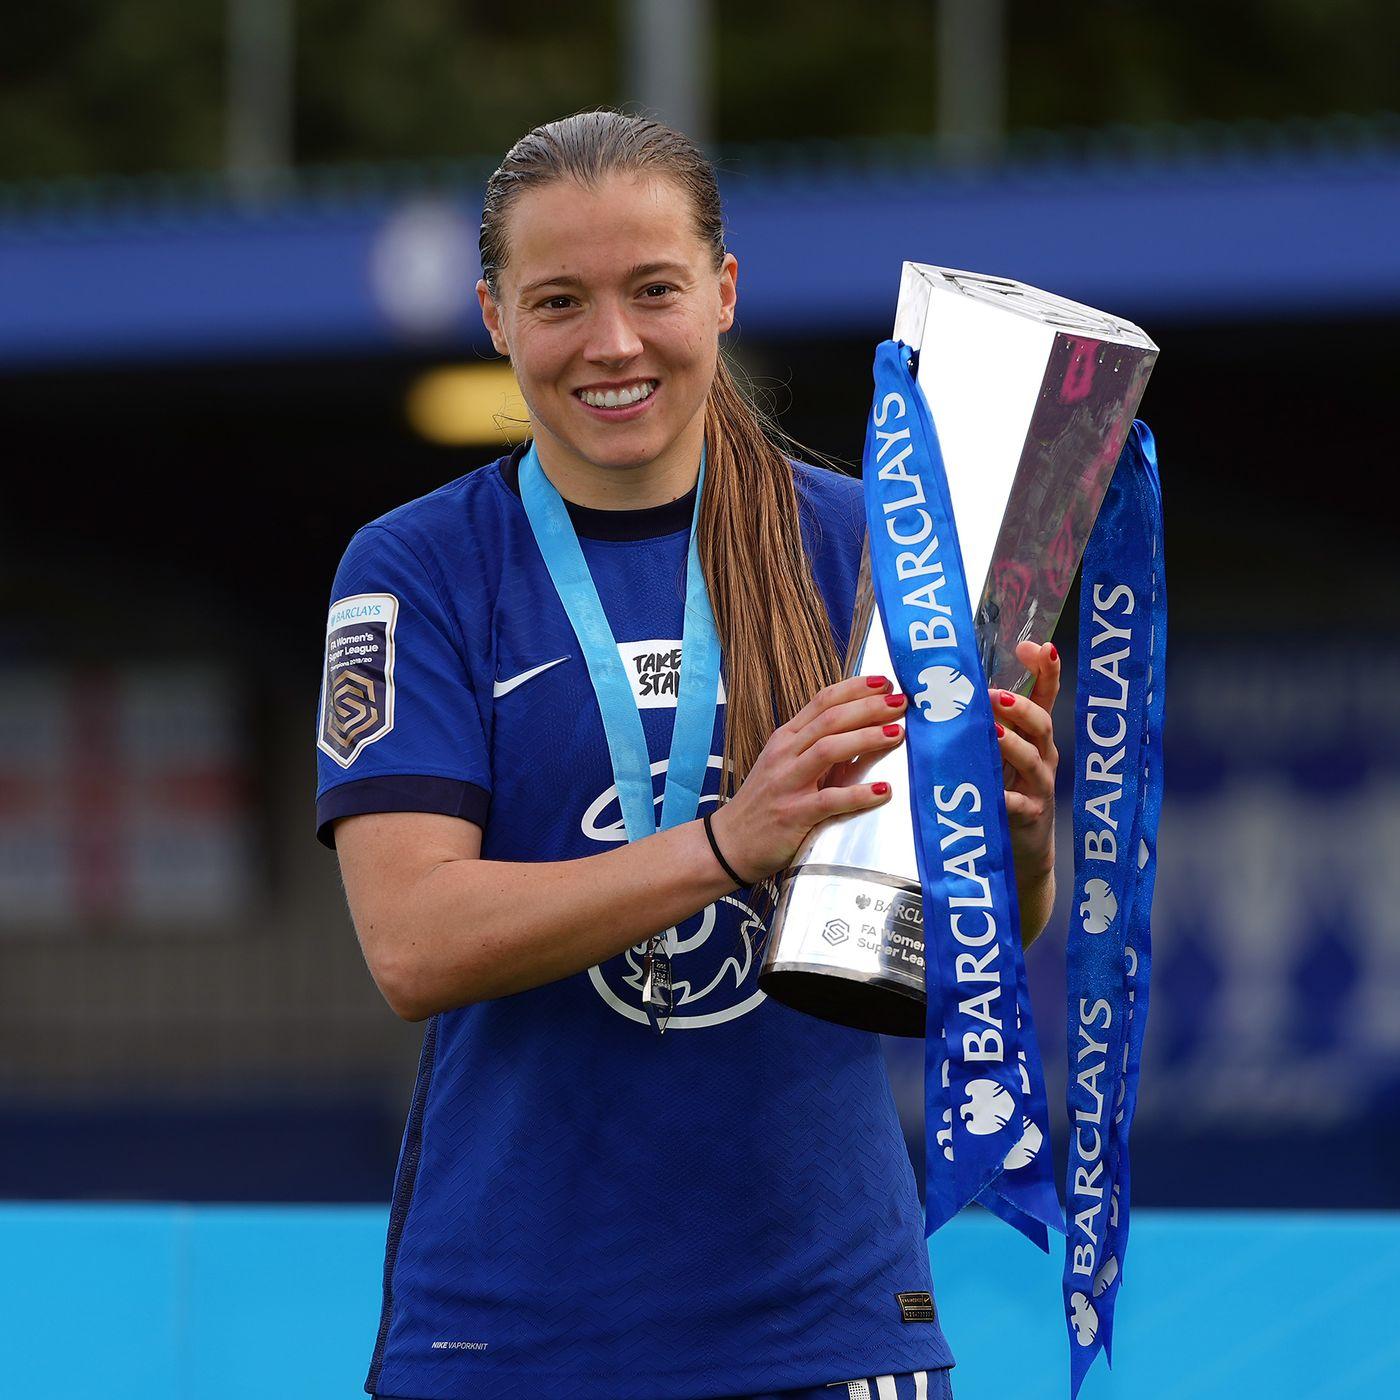 The Women's Football Show: Toni Duggan's WSL return, Fran Kirby's incredible comeback and Chelsea's quadruple quest continues